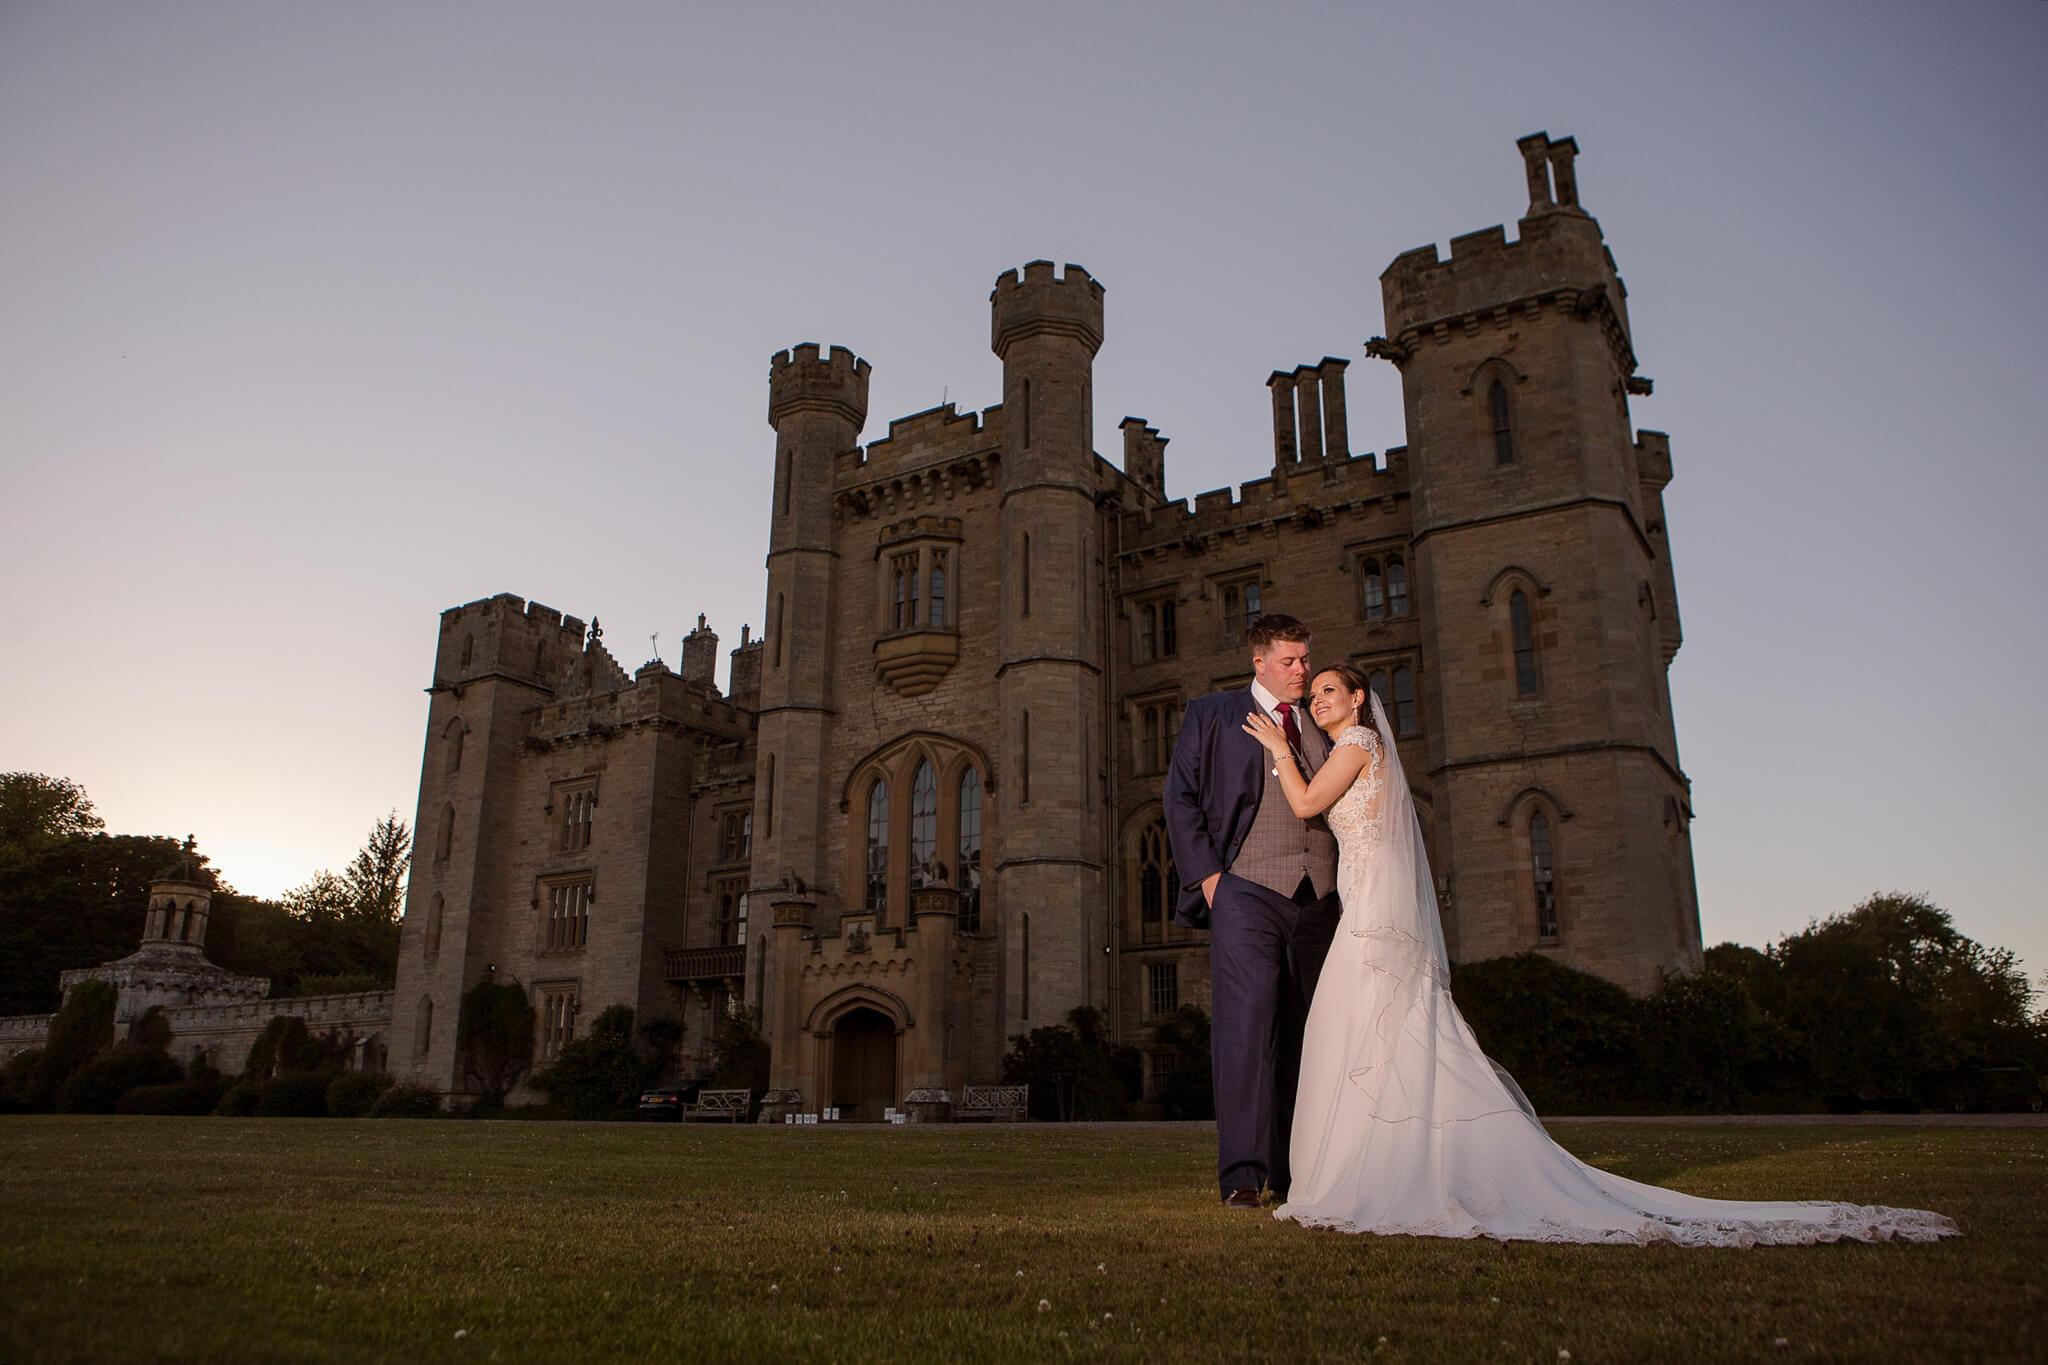 duns-castle-wedding-photograper-scotland-stanbury-photography-020